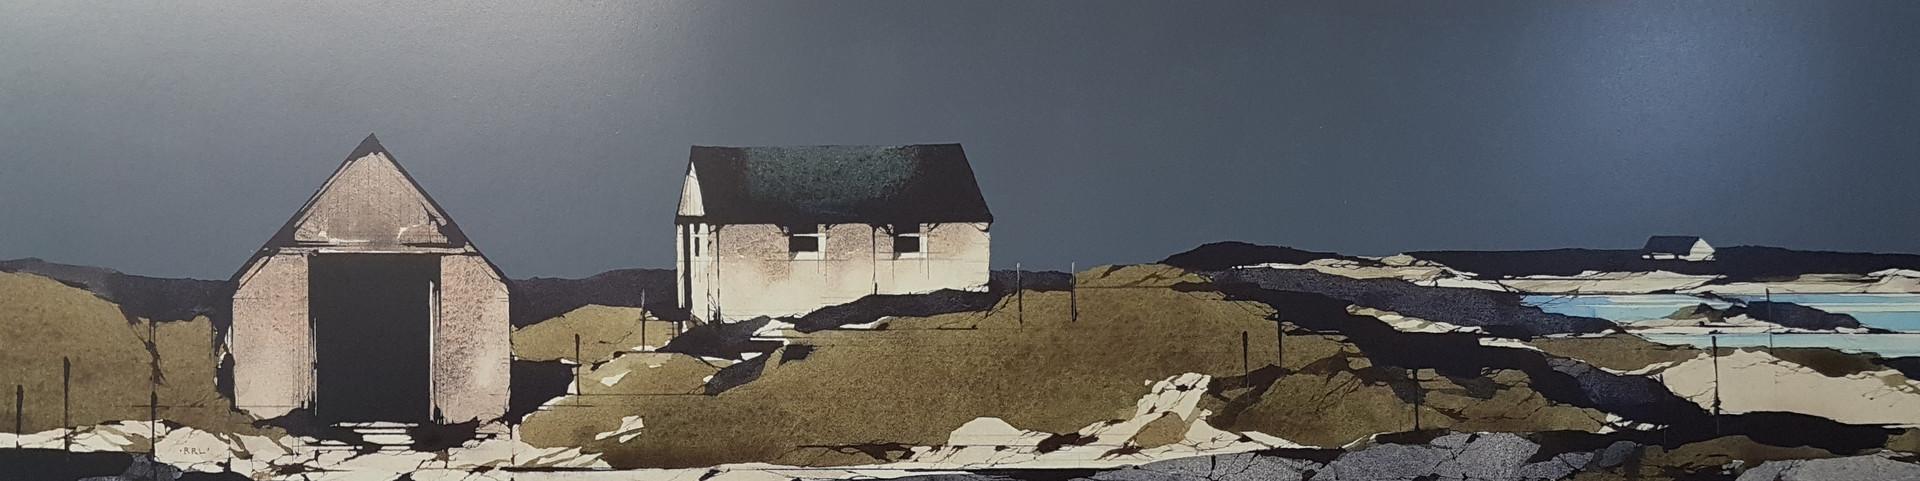 Boathouse at Traigh, Arisaig